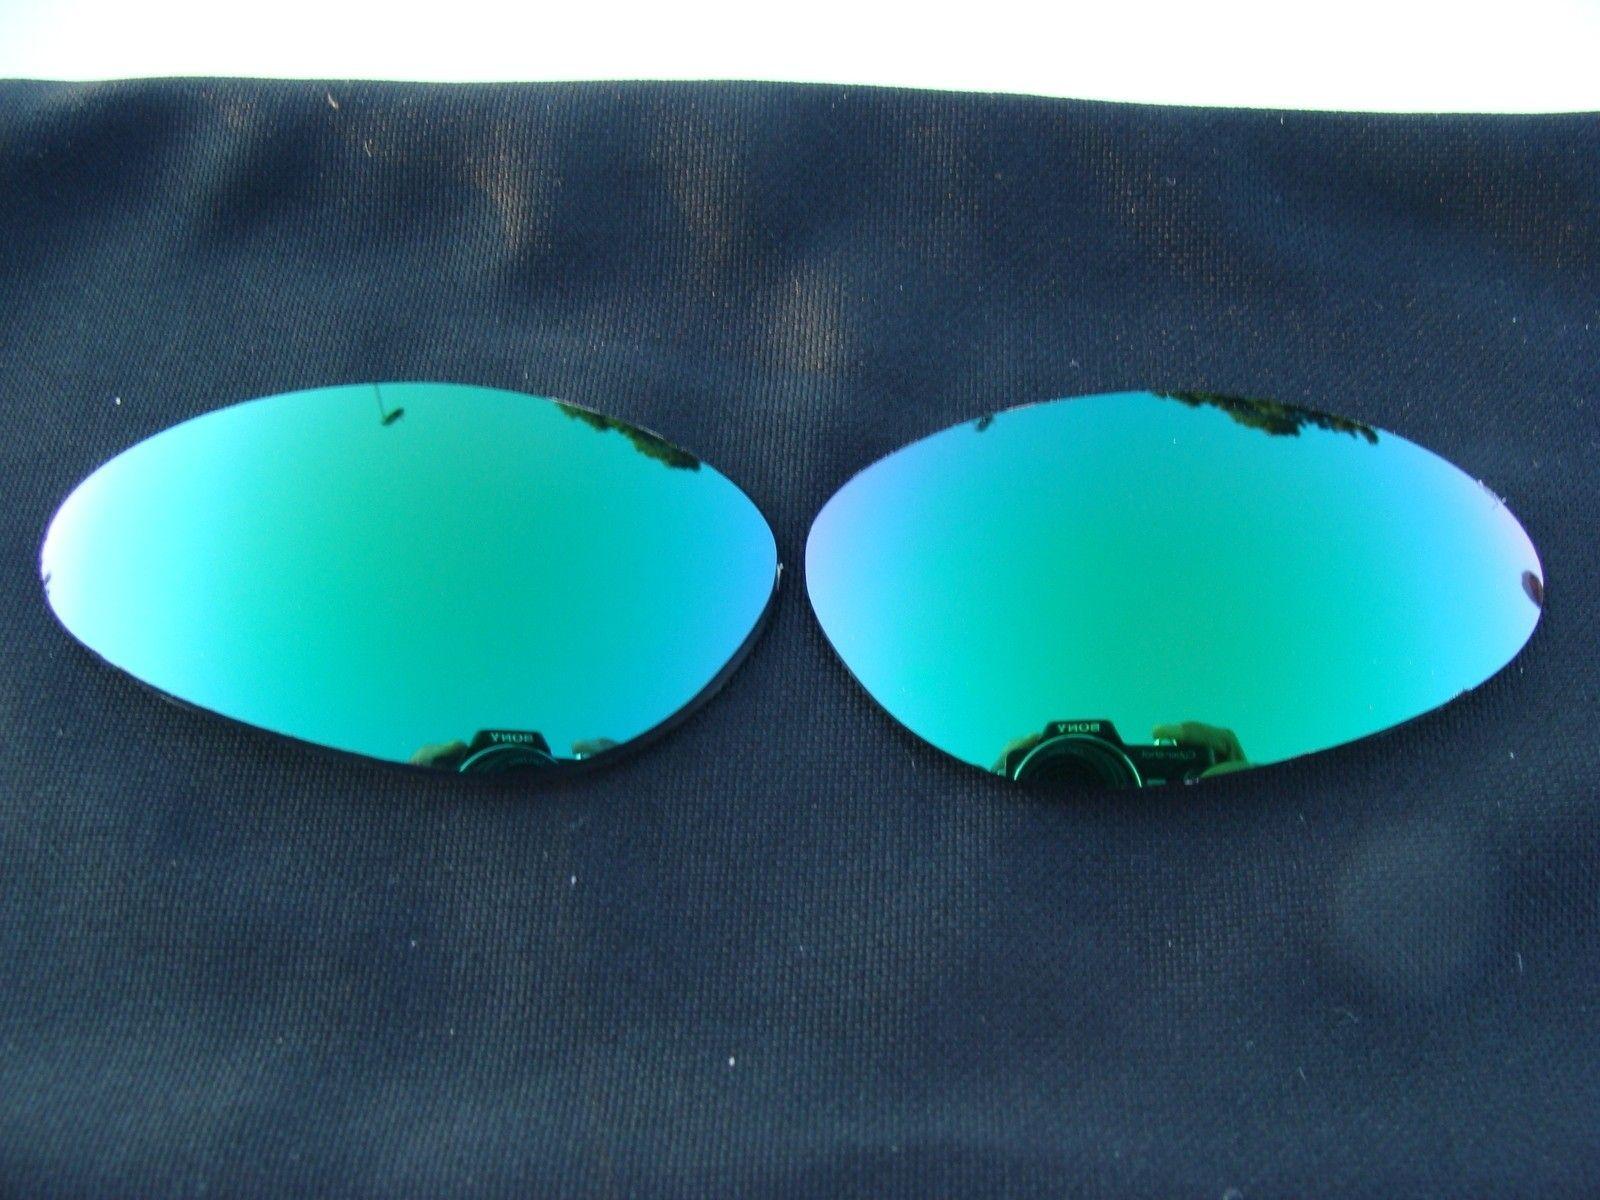 Custom Cut (Oakley) Lenses For Penny 10/011: 24k Polar, Red/Purple, Jade, Blue, Fire - DSC04607.JPG